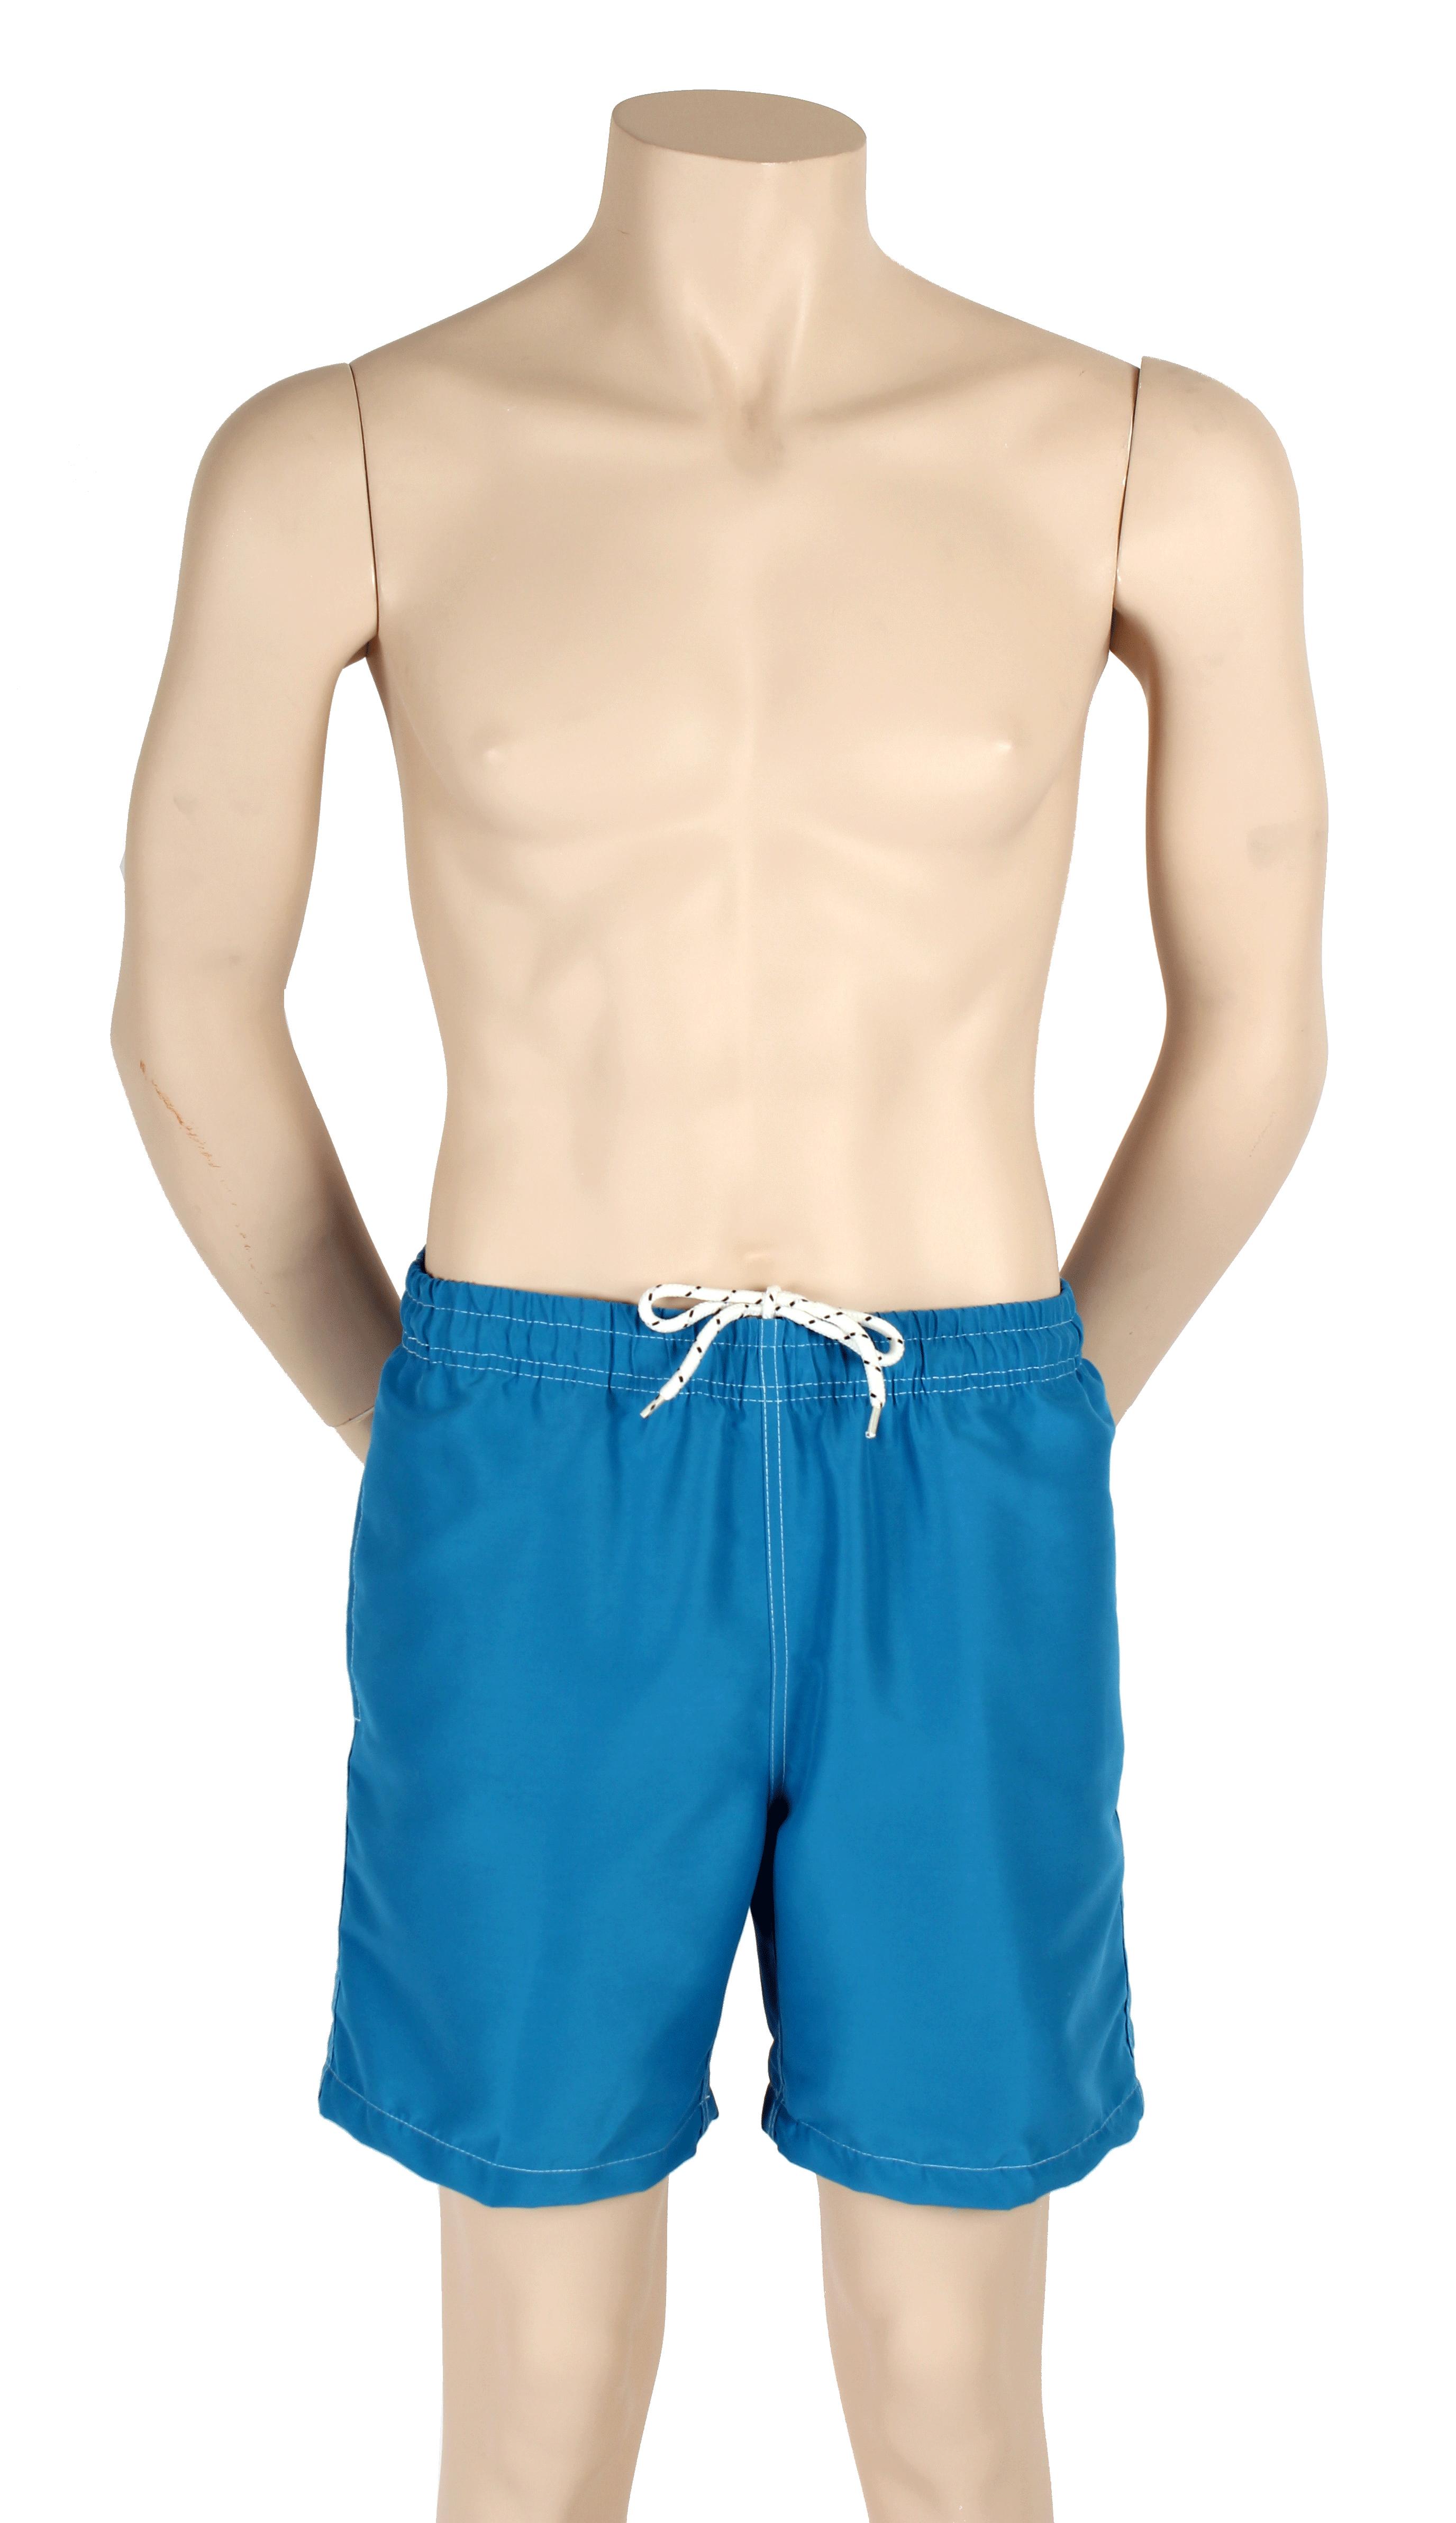 Men's Lined Swim Trunk